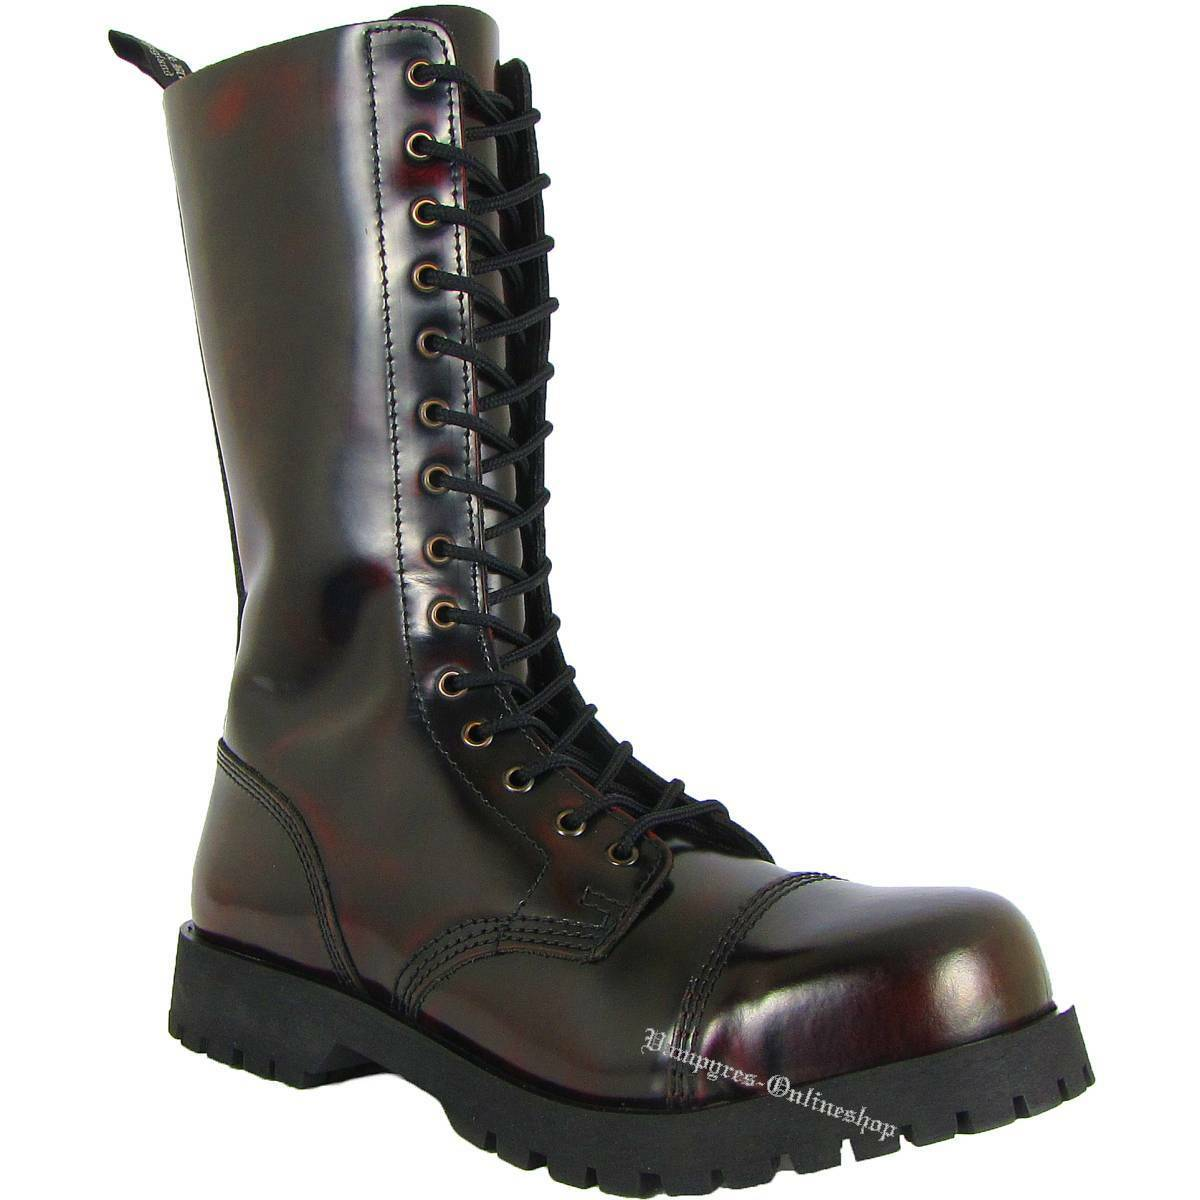 botas & Braces 14 agujeros botas botas botas Burgundy Rub off rojo negro and rangers cuero  colores increíbles